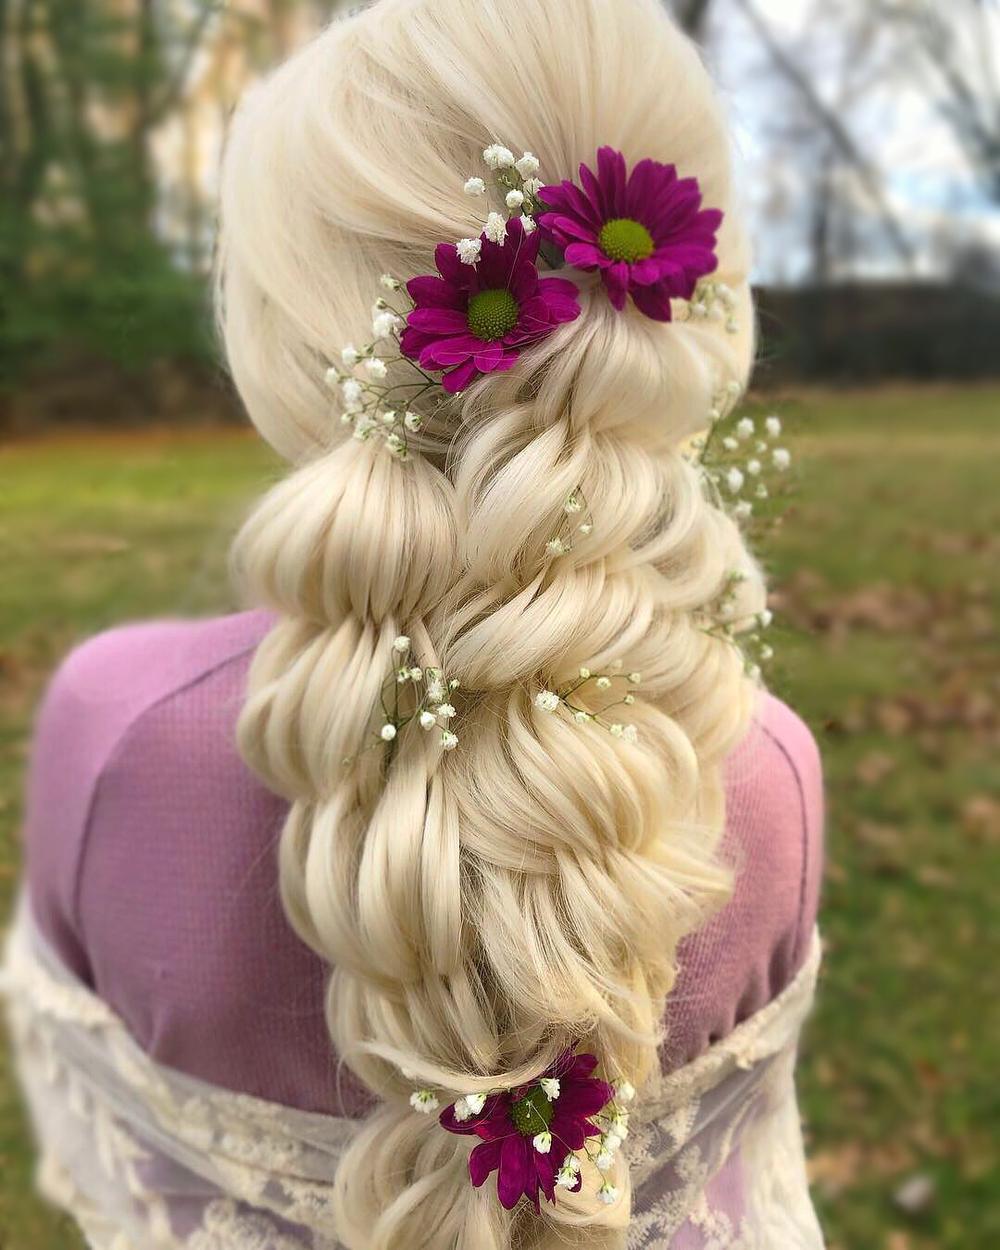 Natalie Thomas, @Bridal_bynatalie, Best Braid